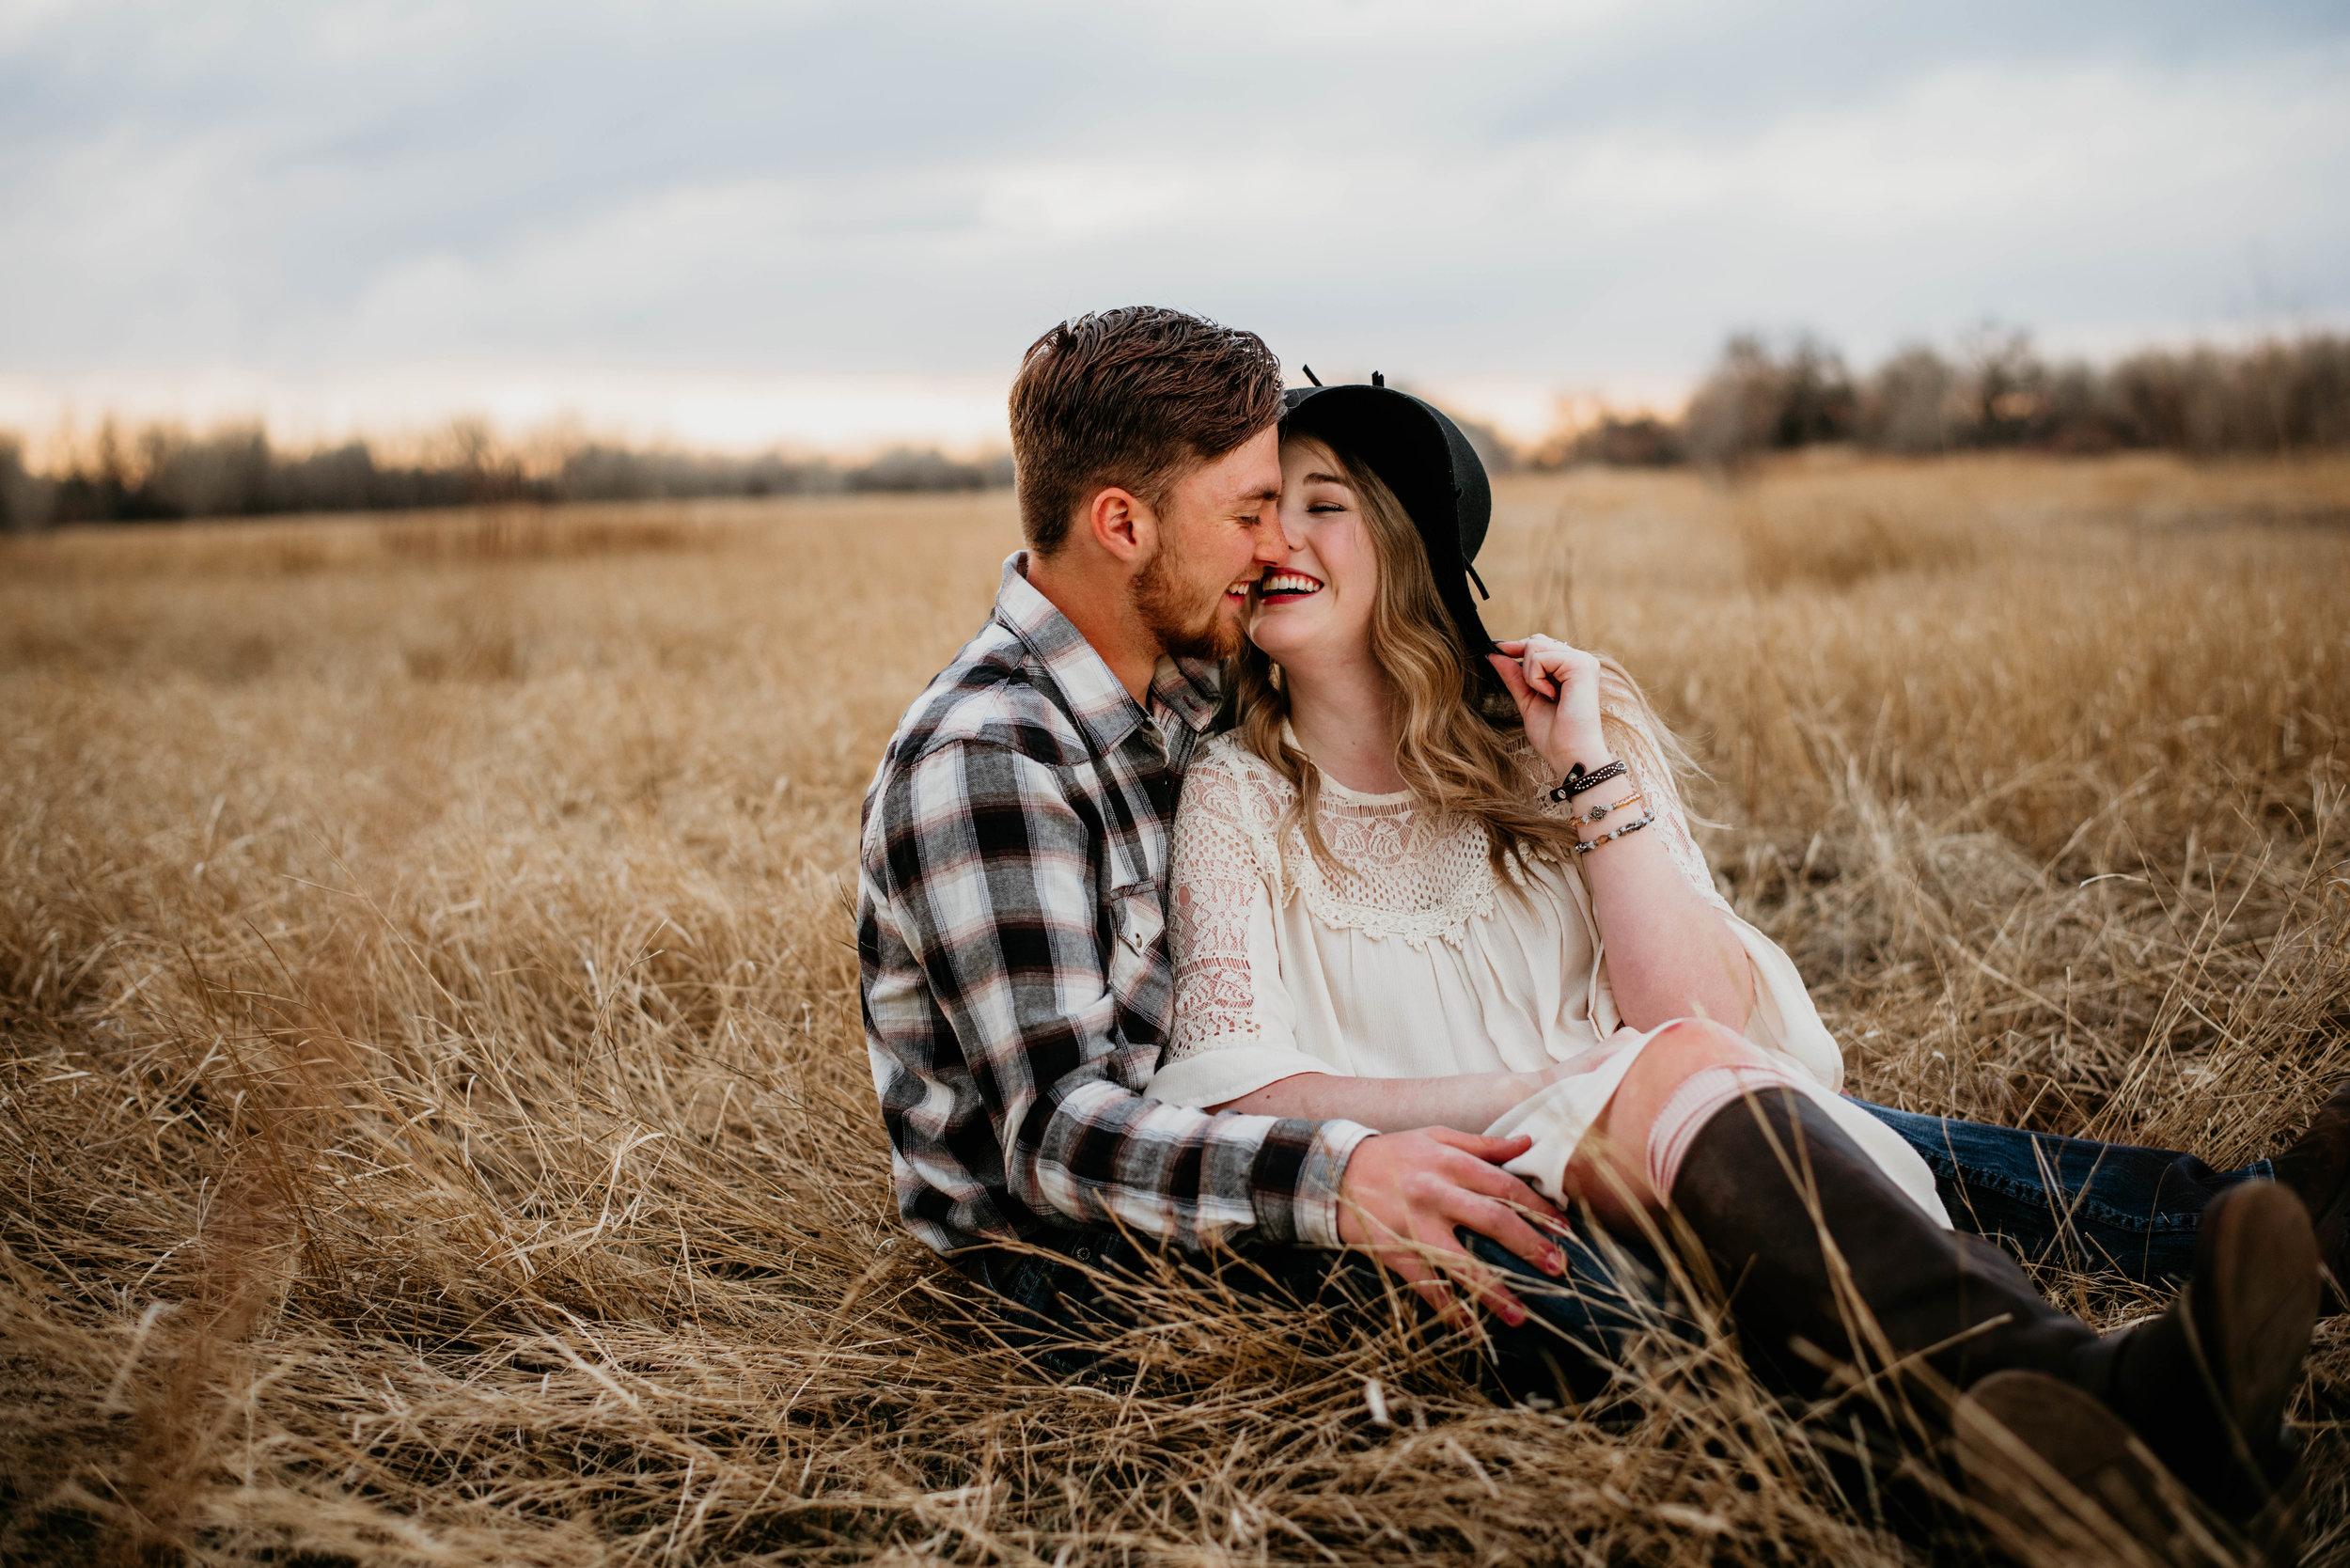 Miss. Miller's Photography | Colorado Wedding Photographer | Colorado engagement photographer | Colorado couples photographer | Couples sitting down pose ideas